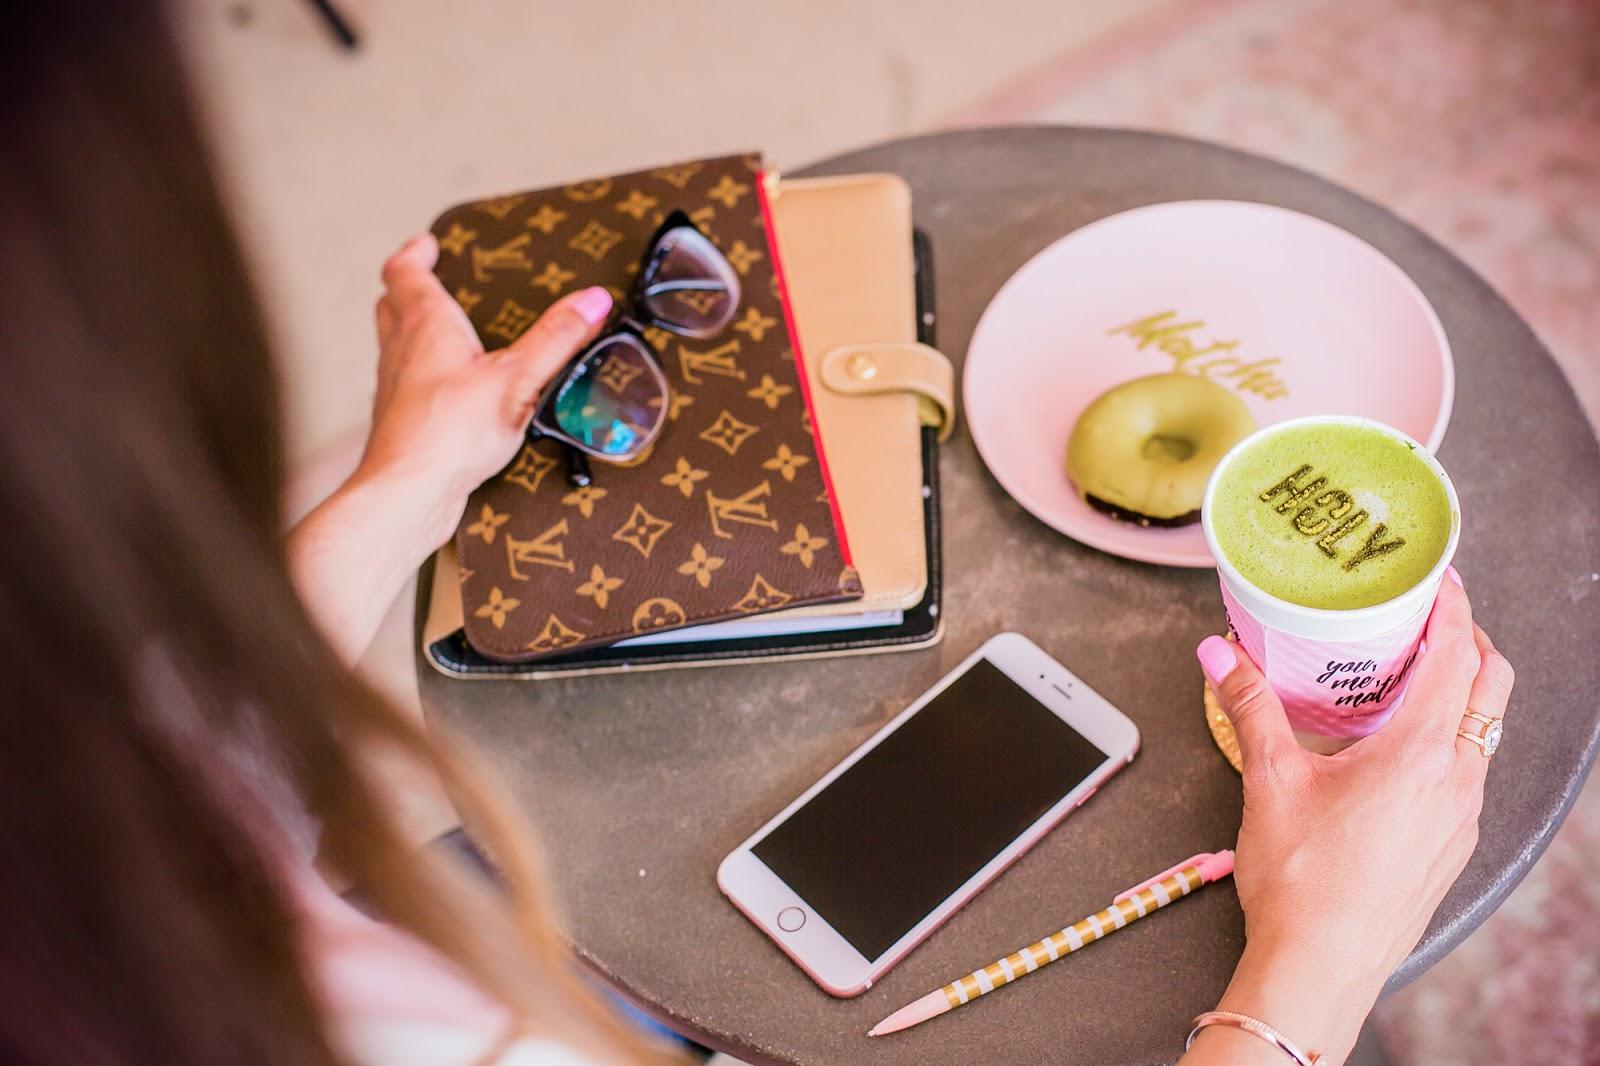 Louis Vuitton clutch, Chanel eyeglasses